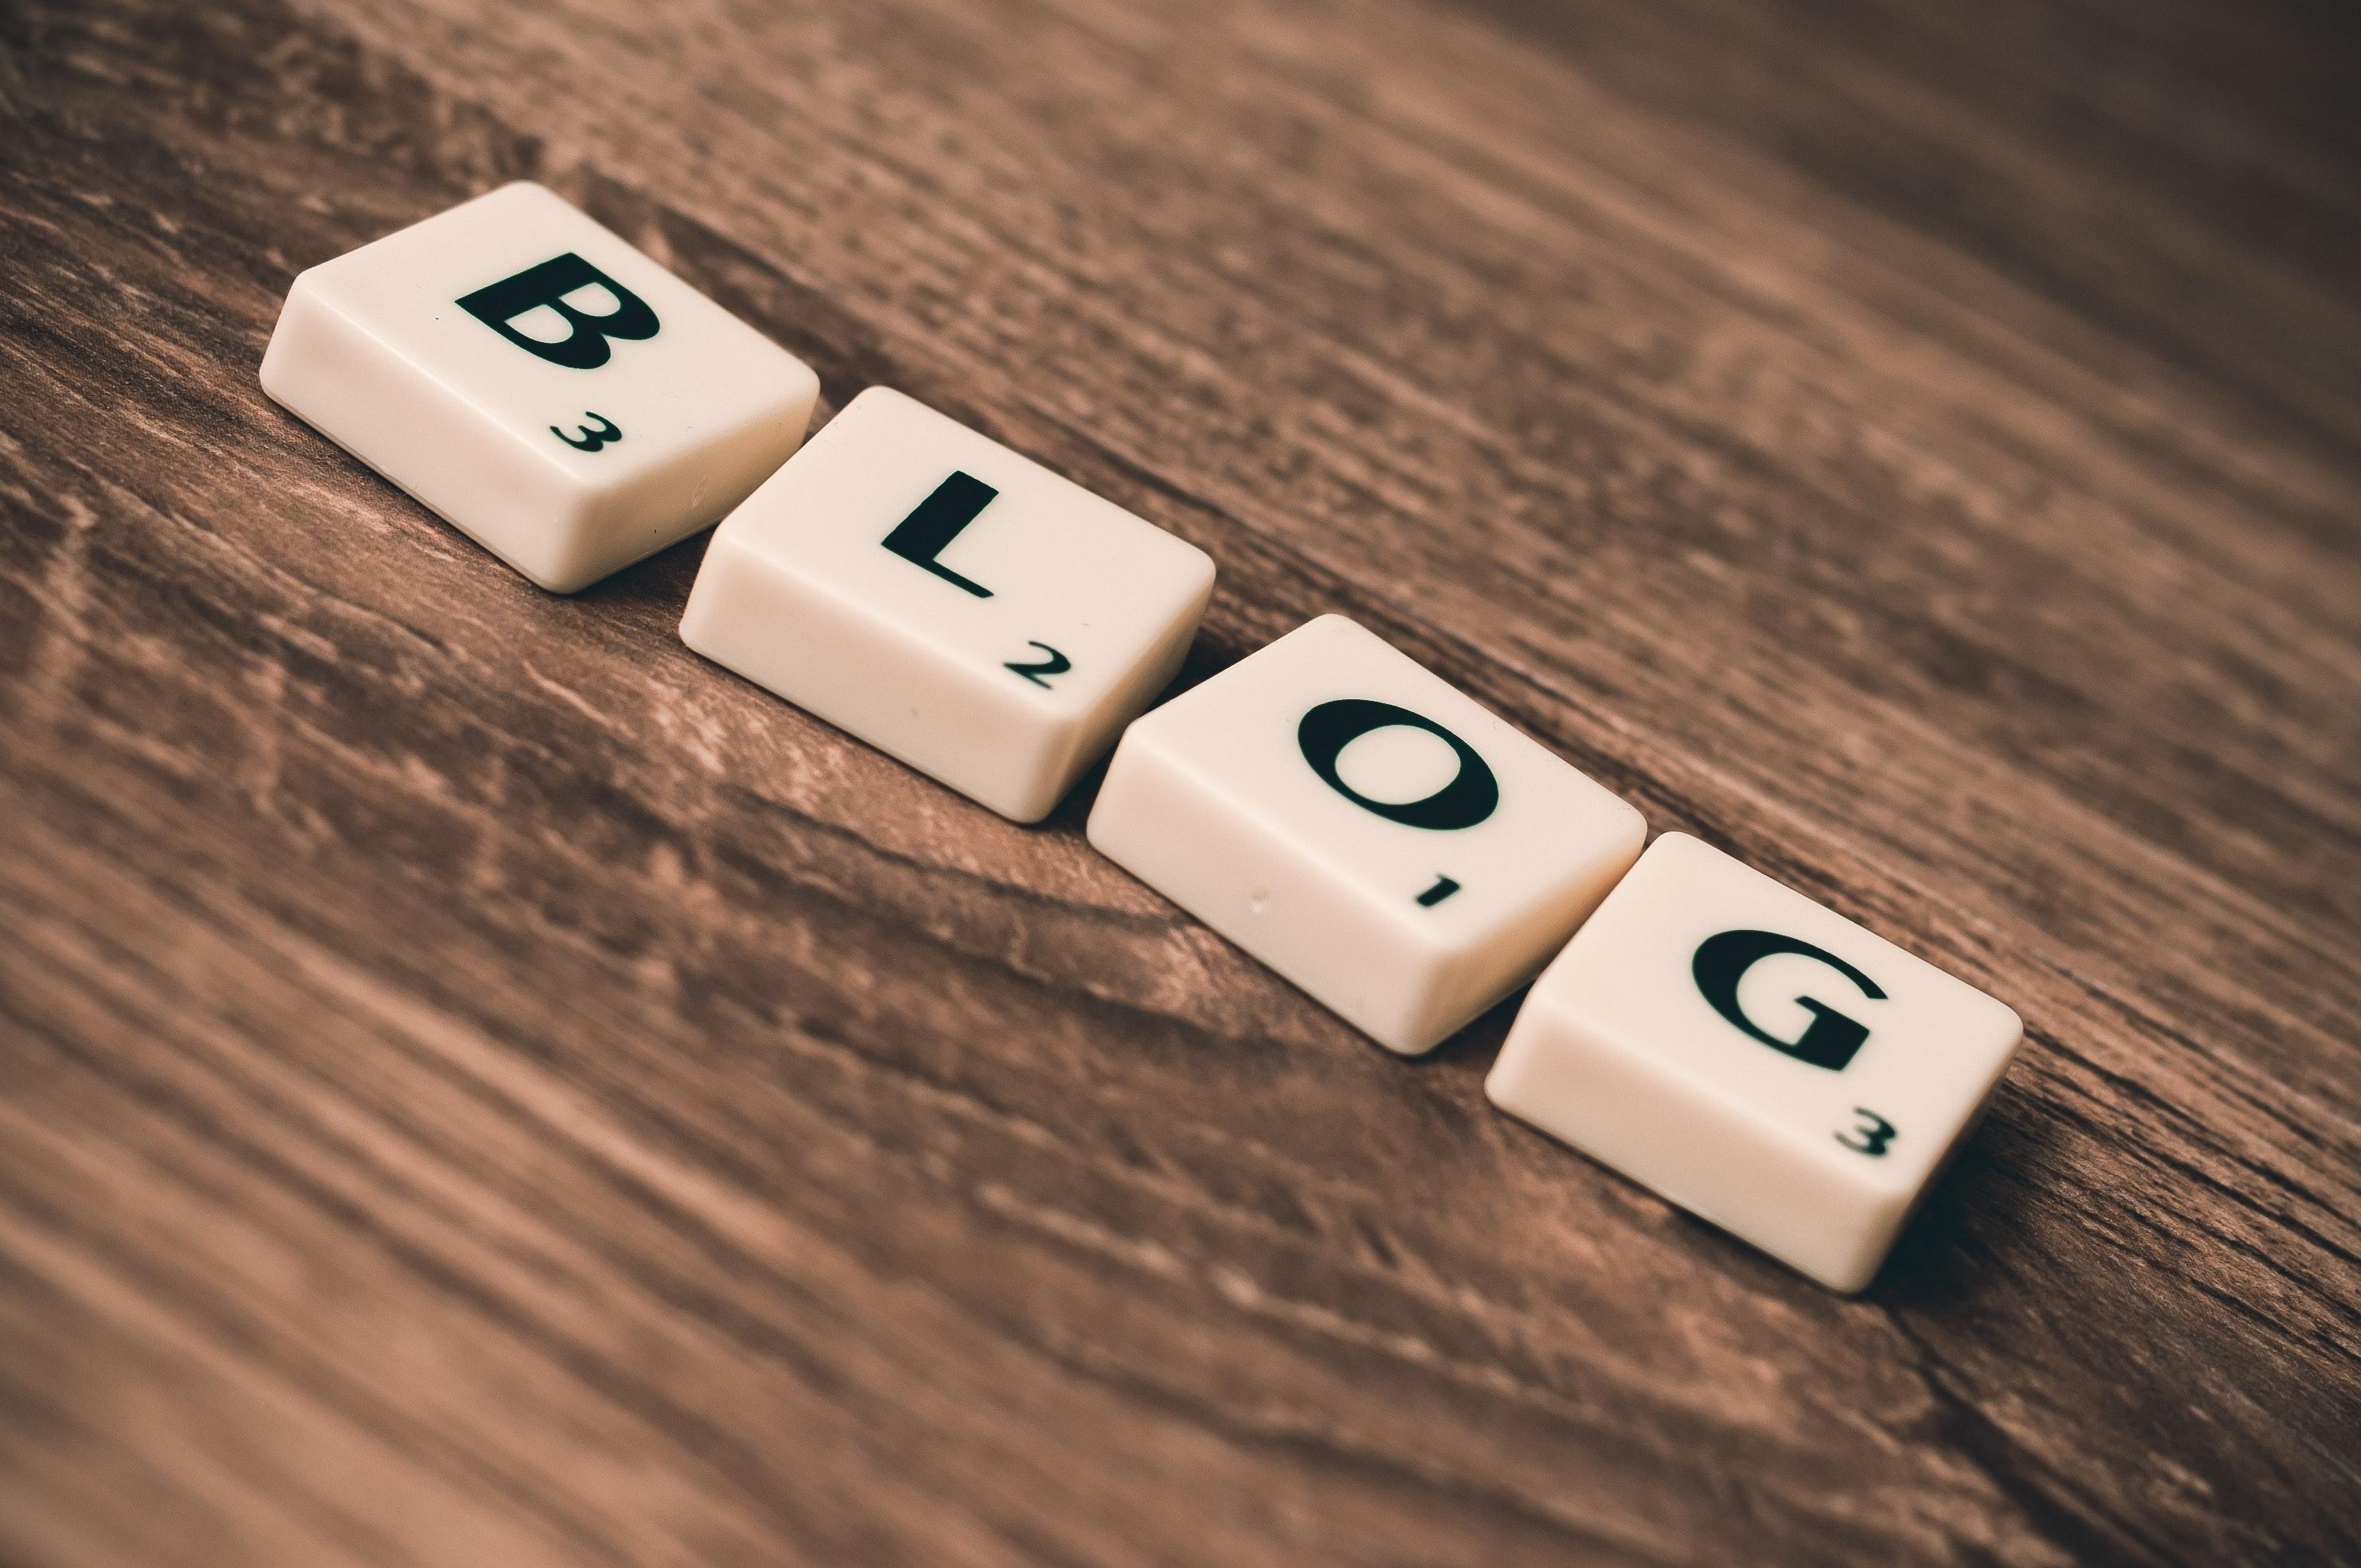 blog-icon-information-internet-262508